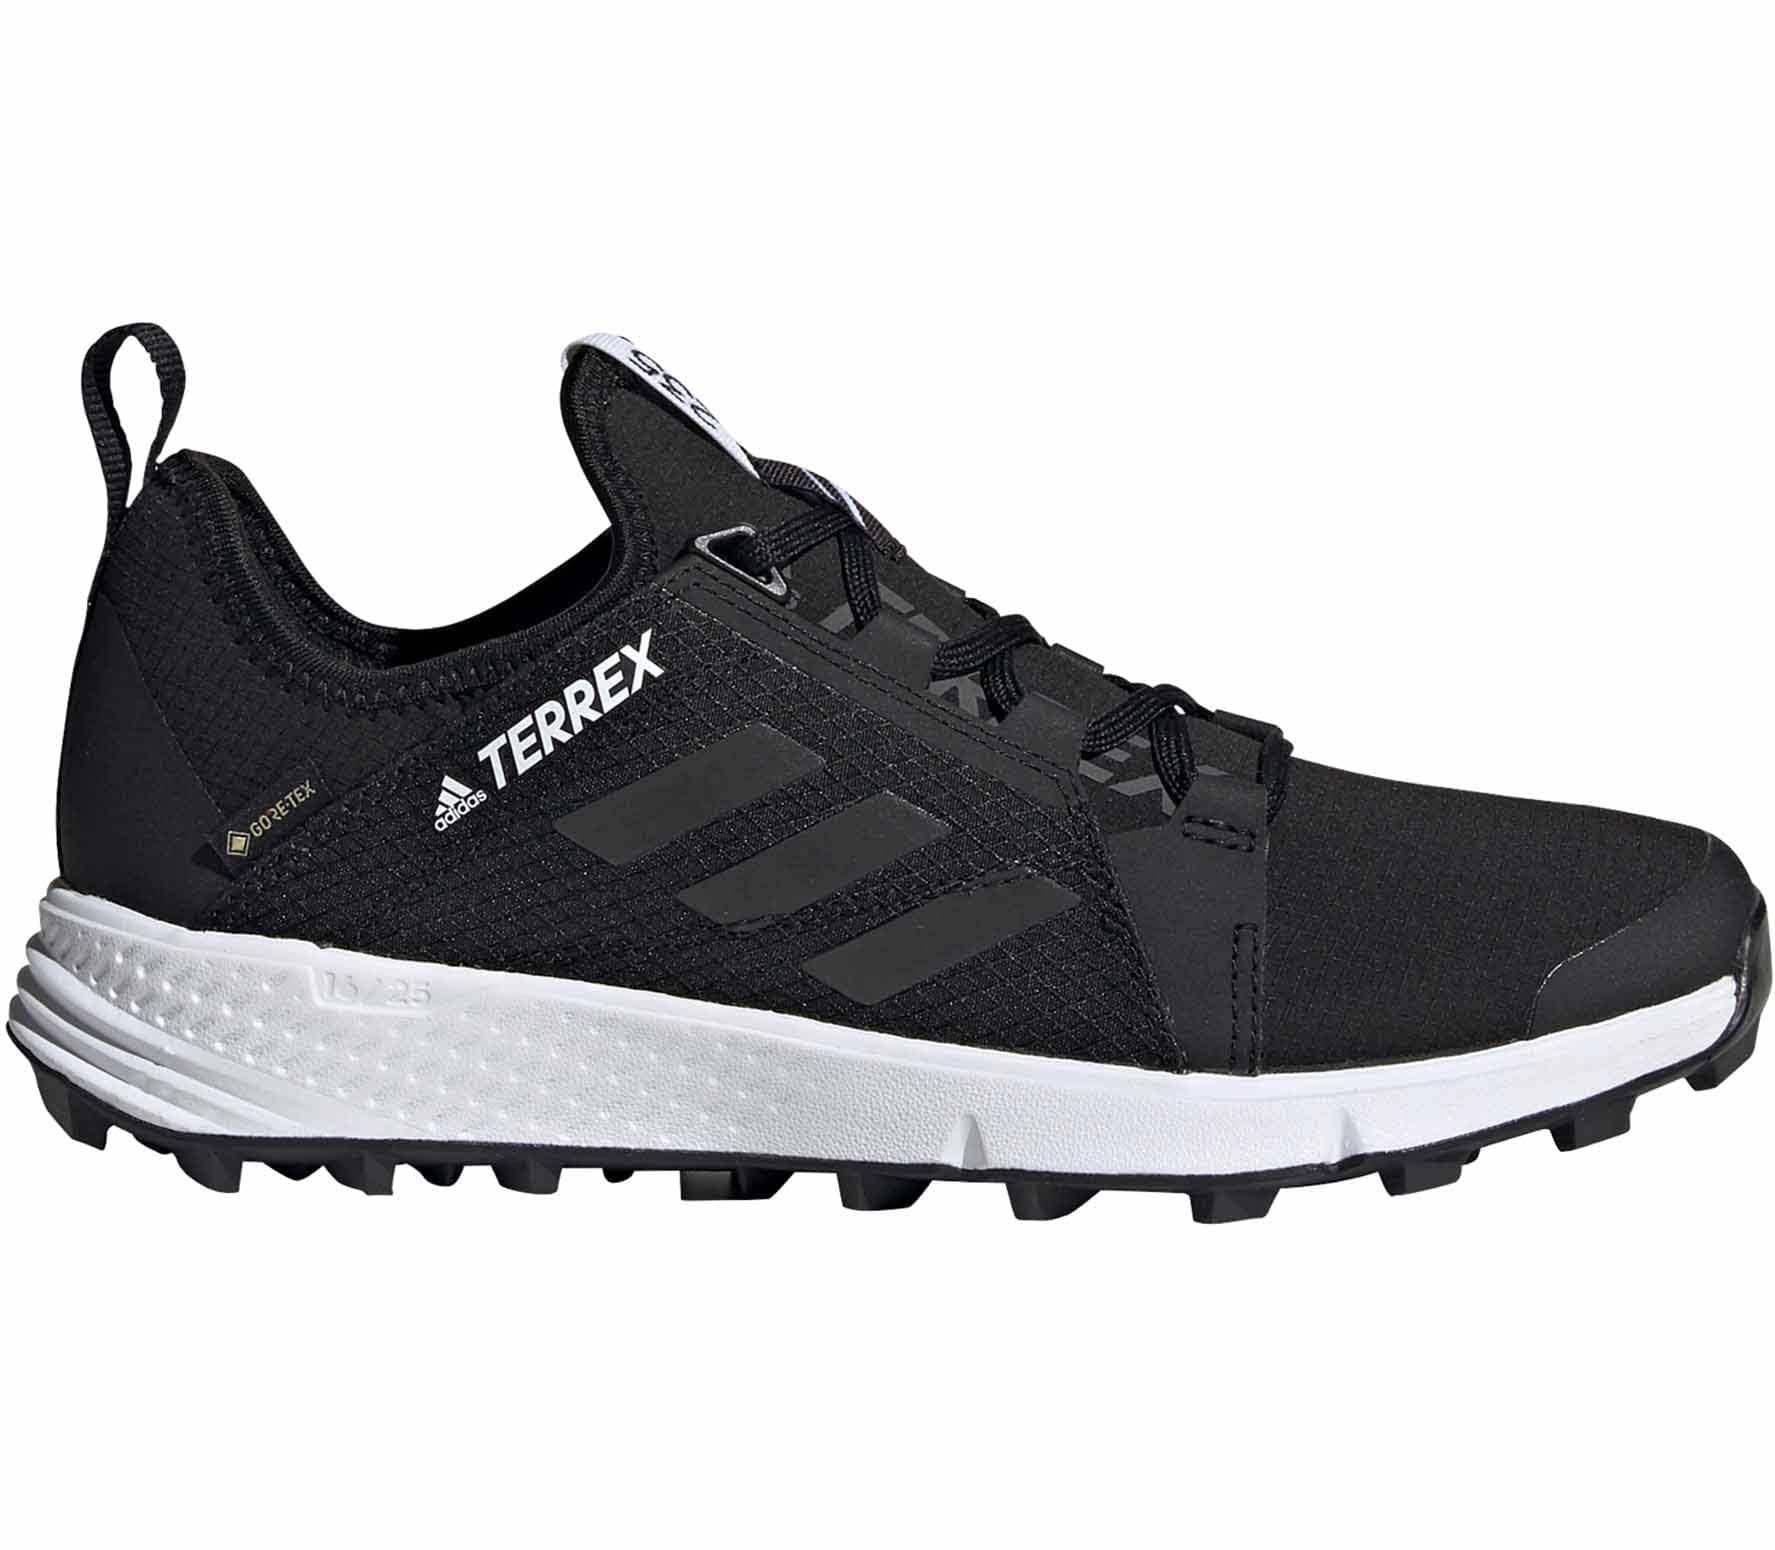 Adidas Terrex Speed Gore Tex Women's Trail Running Shoes - Black - 4